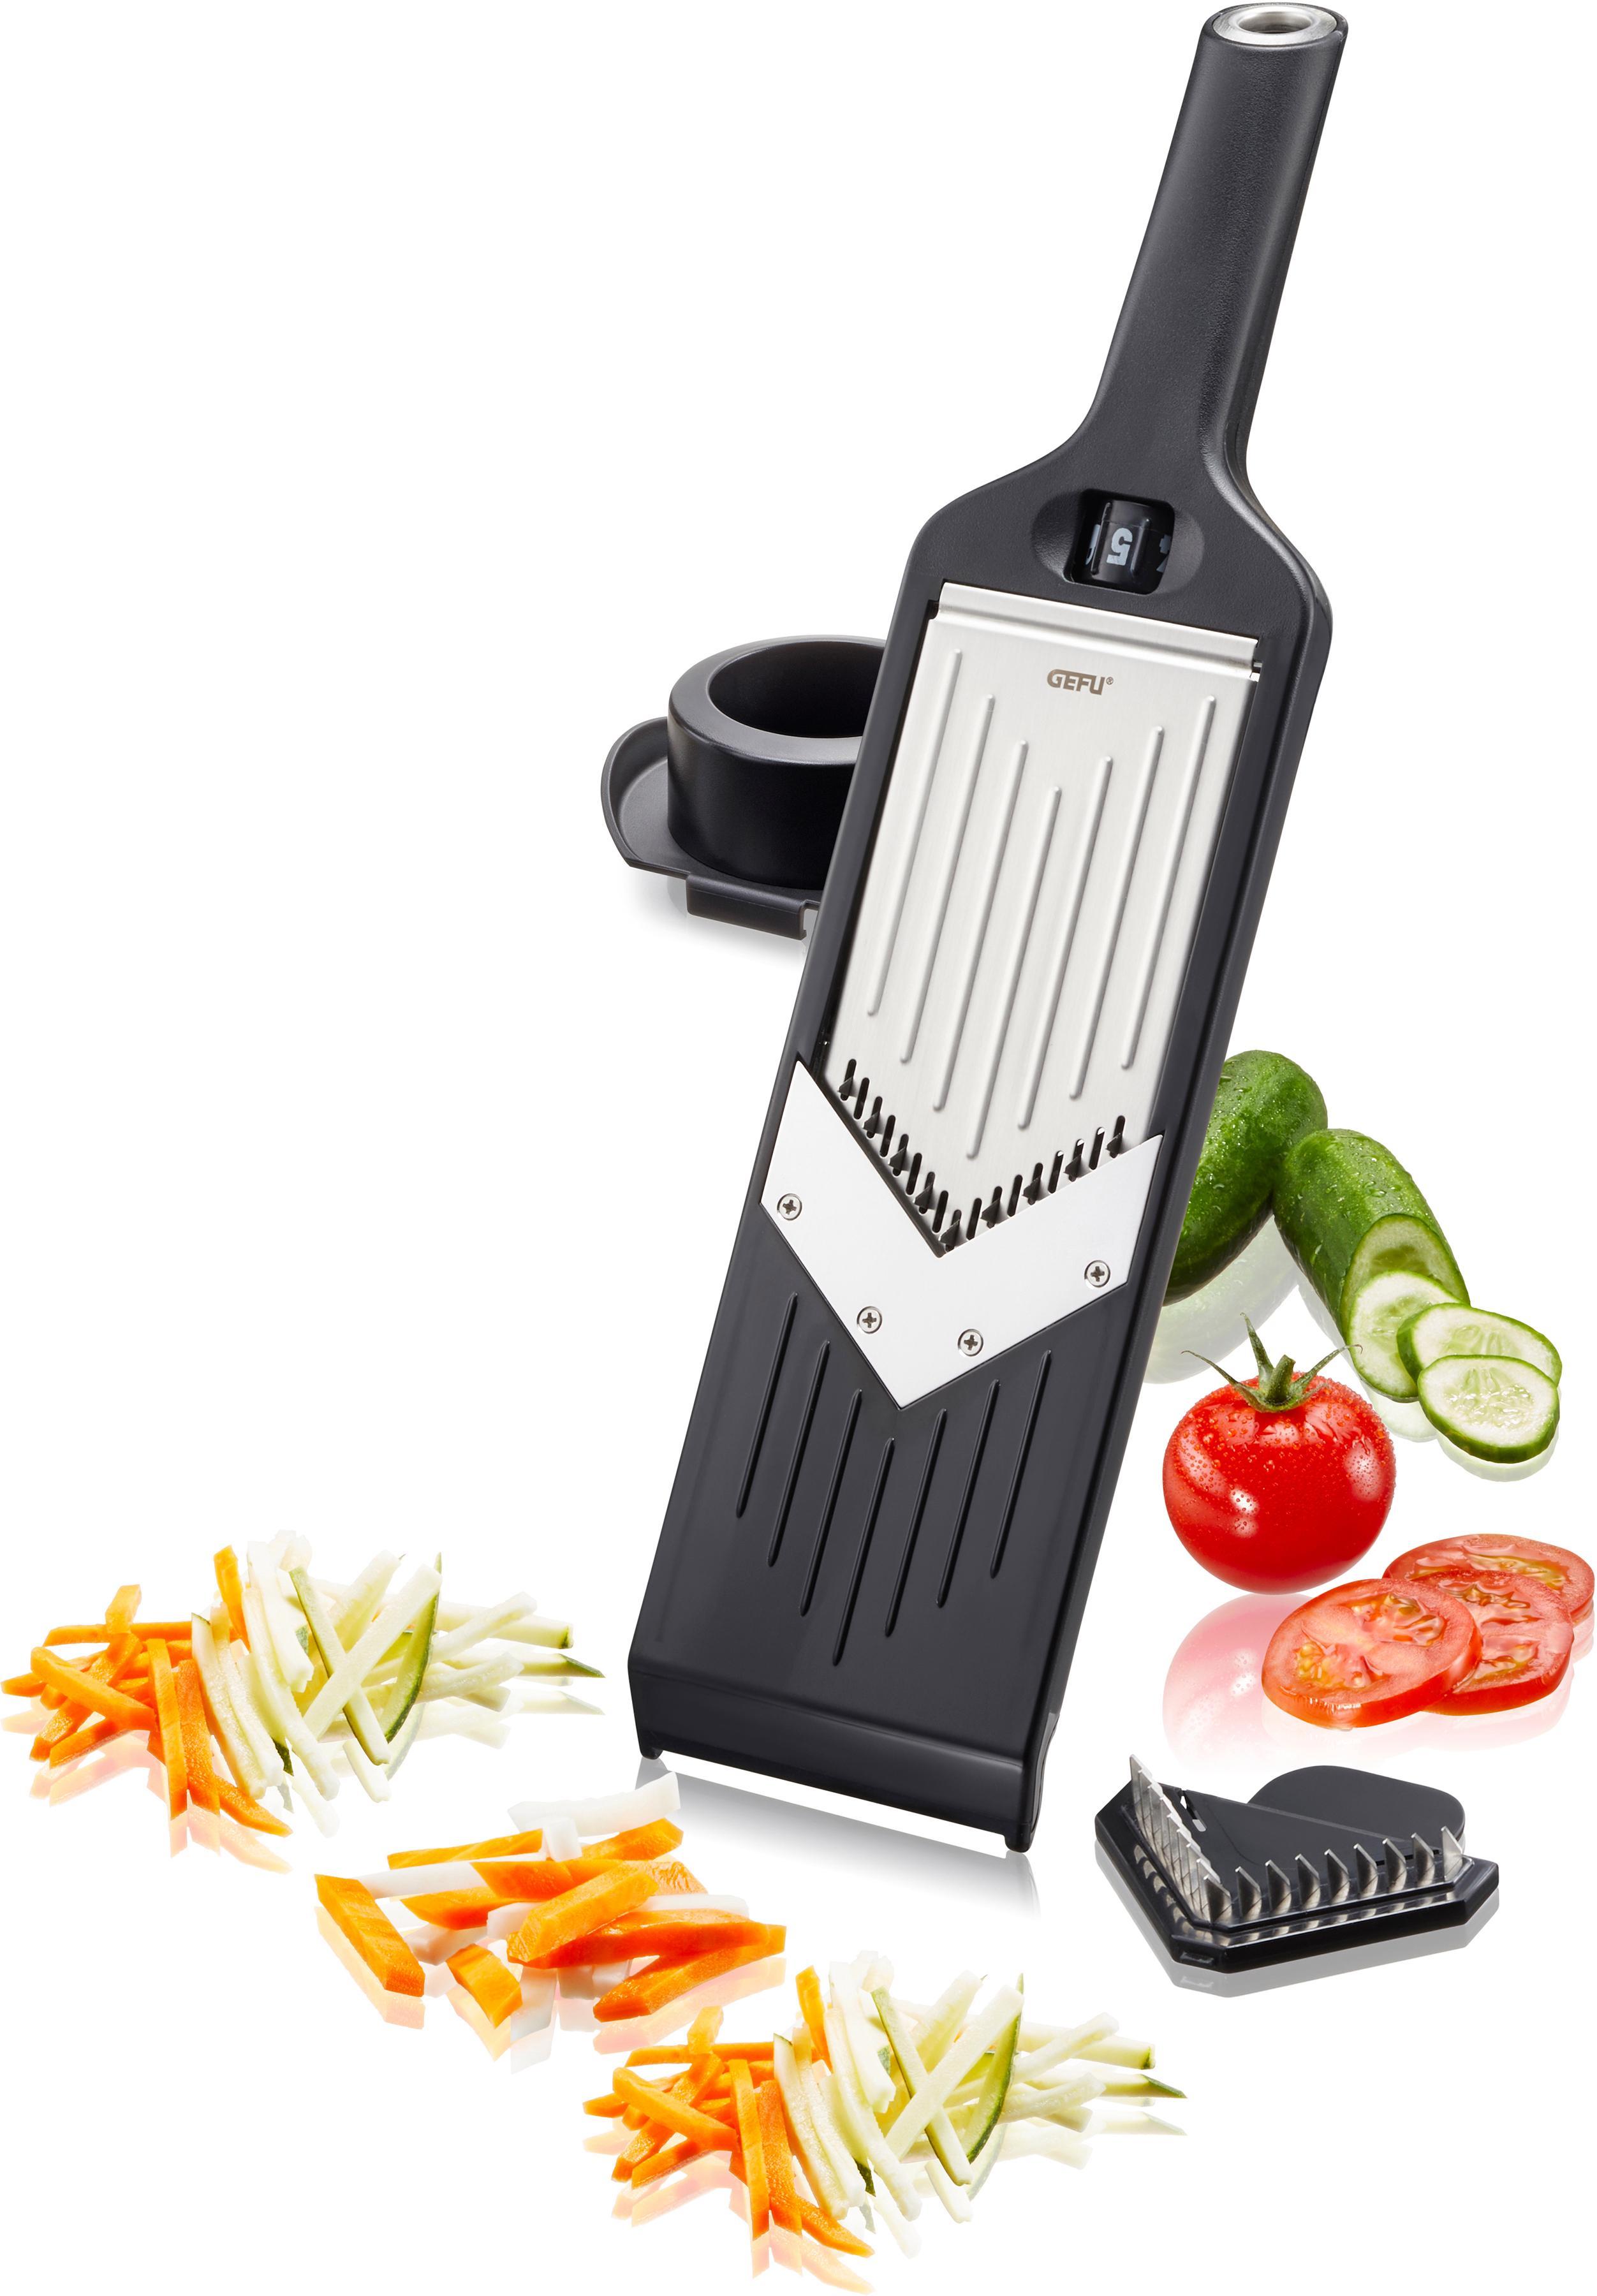 GEFU Gemüsehobel VIOLI 2.0, V-Hobel Julienne schwarz Reiben Hobel Kochen Backen Haushaltswaren Küchenreiben